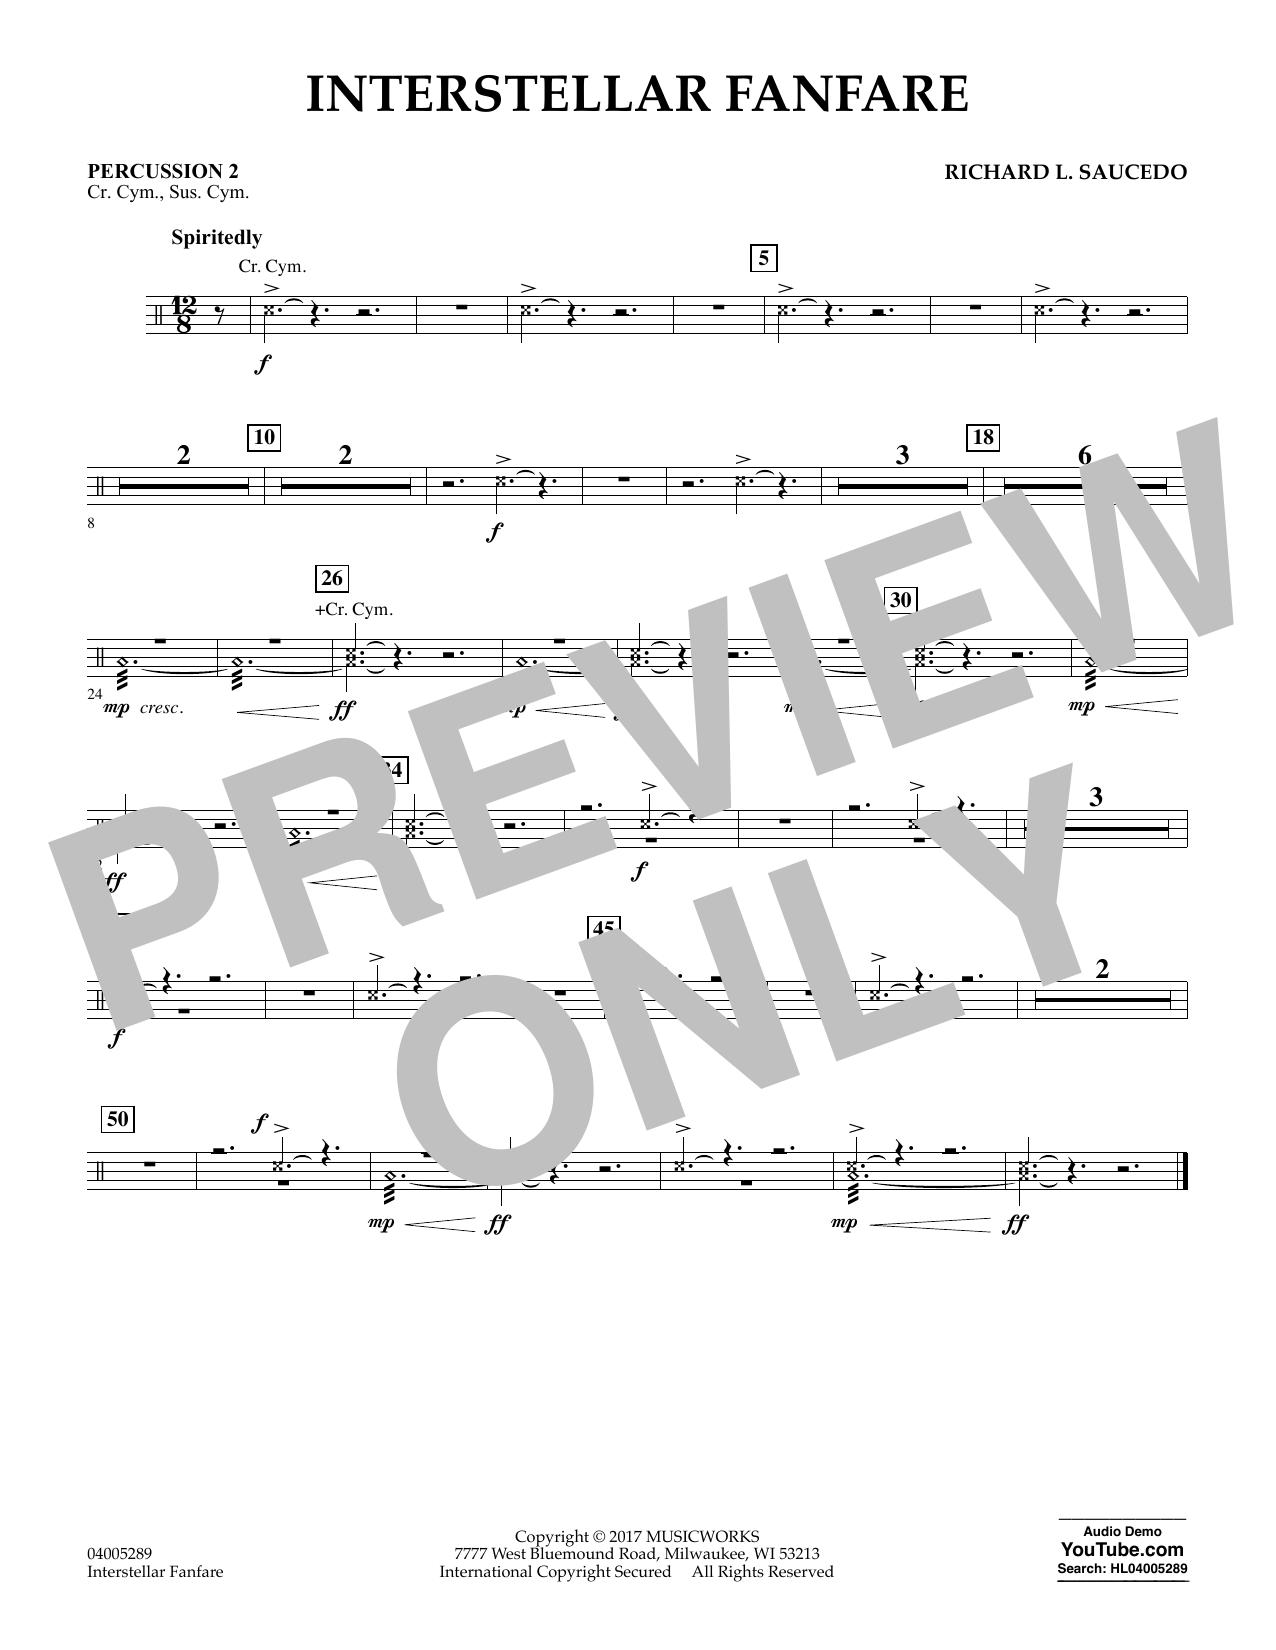 Richard L. Saucedo Interstellar Fanfare - Percussion 2 sheet music notes printable PDF score